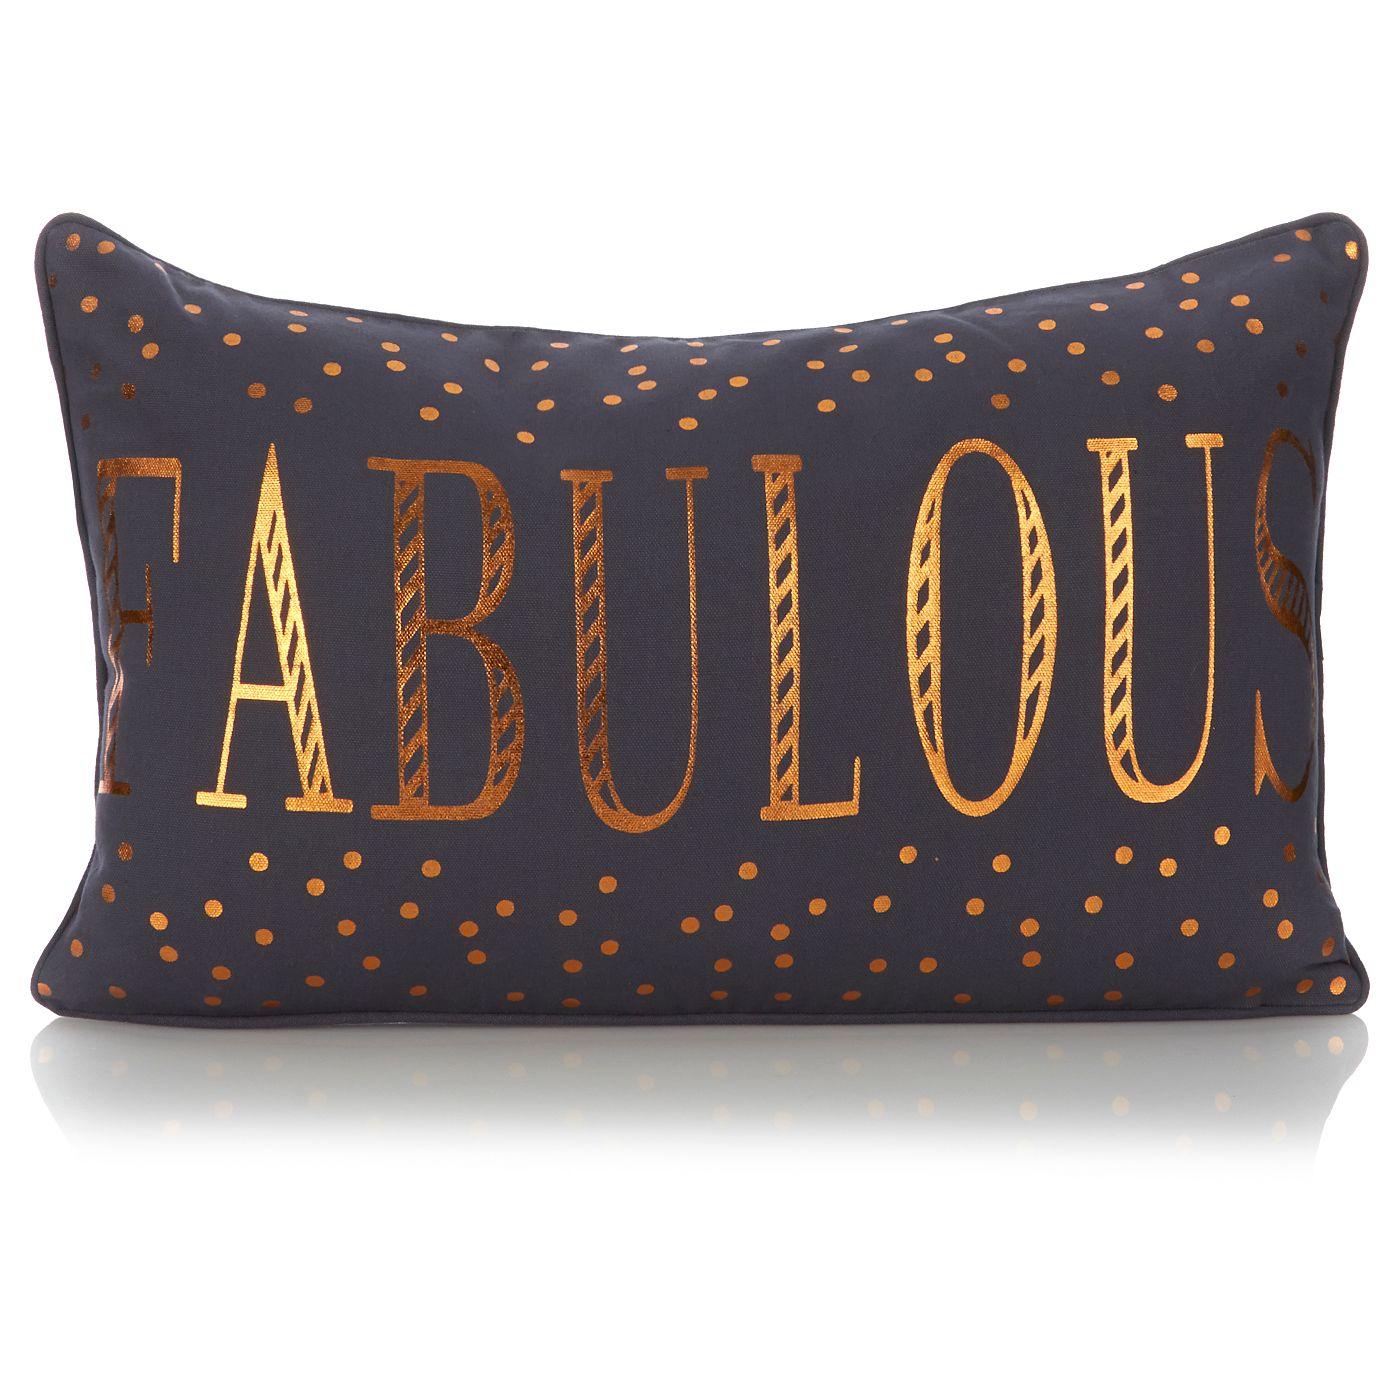 George Home Gold Fabulous Cushion Cushions ASDA direct